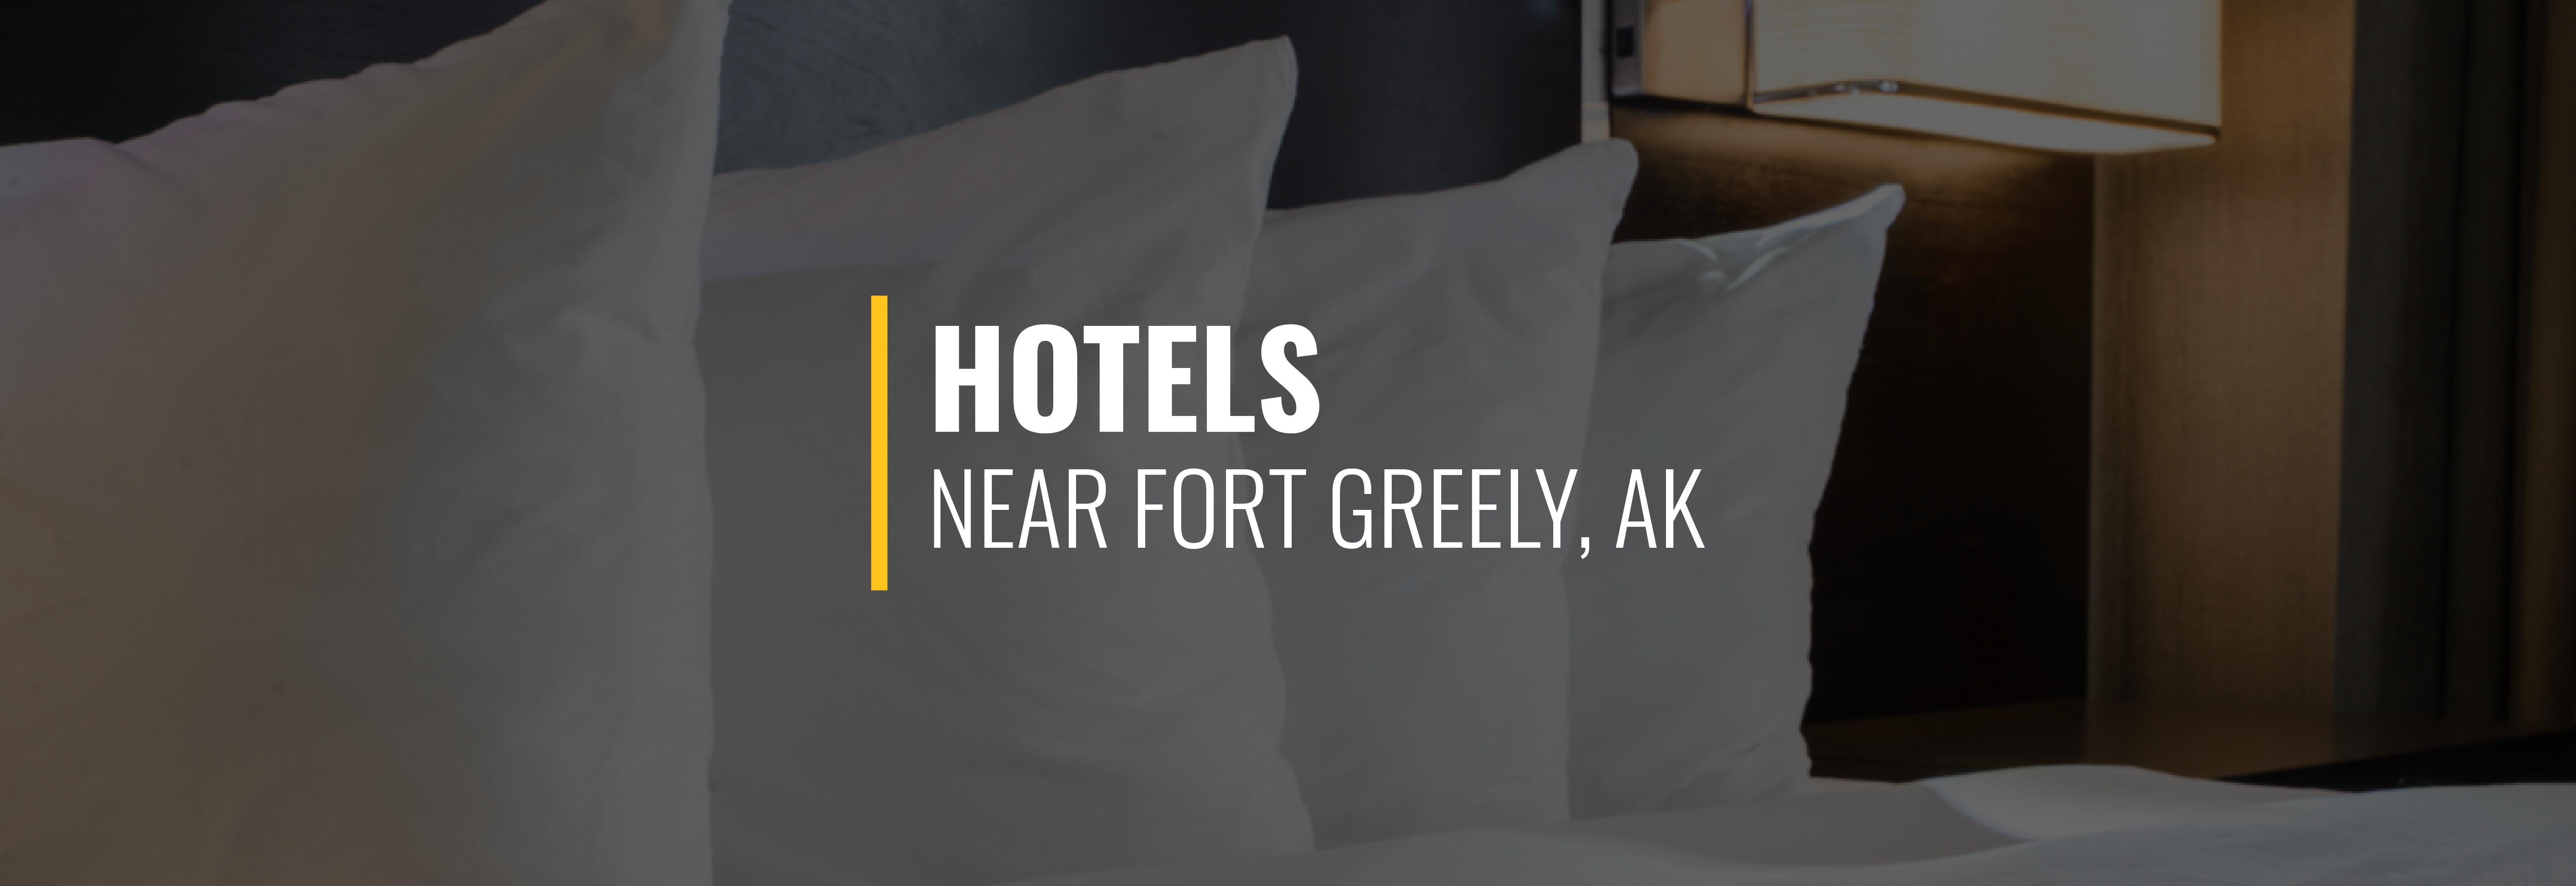 Fort Greely, Alaska Hotels